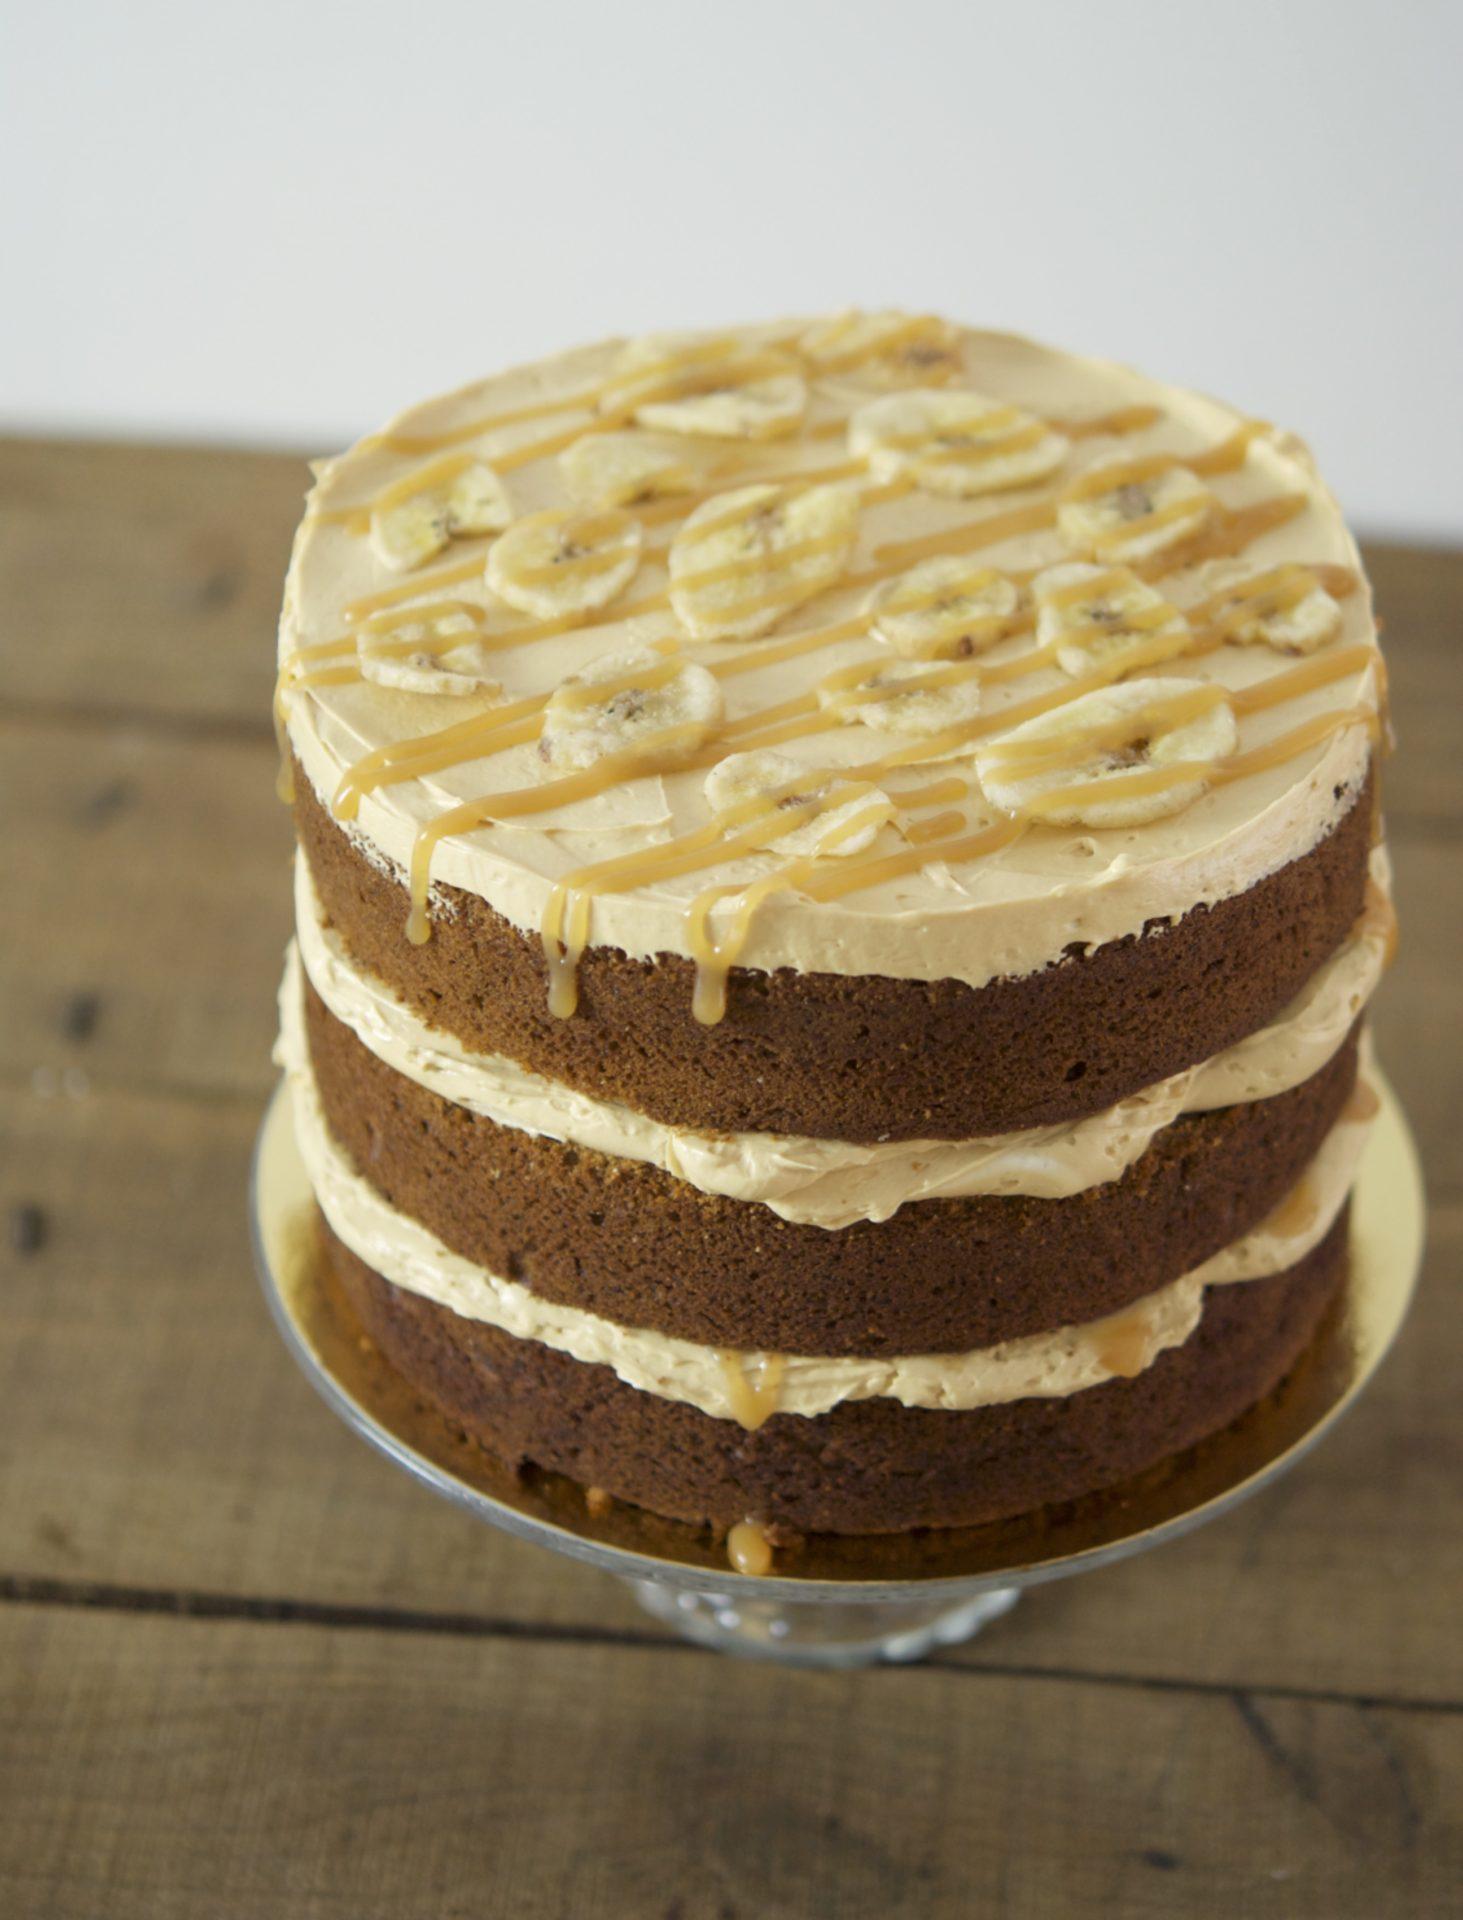 naked-cake-layer-cake-dulce-de-leche-mericakes-wedding-cakes-tartas-barcelona-pastel-tarta-de-boda-tarta-celebracion-platano-y-canela-dulce-de-leche-gourmet-3